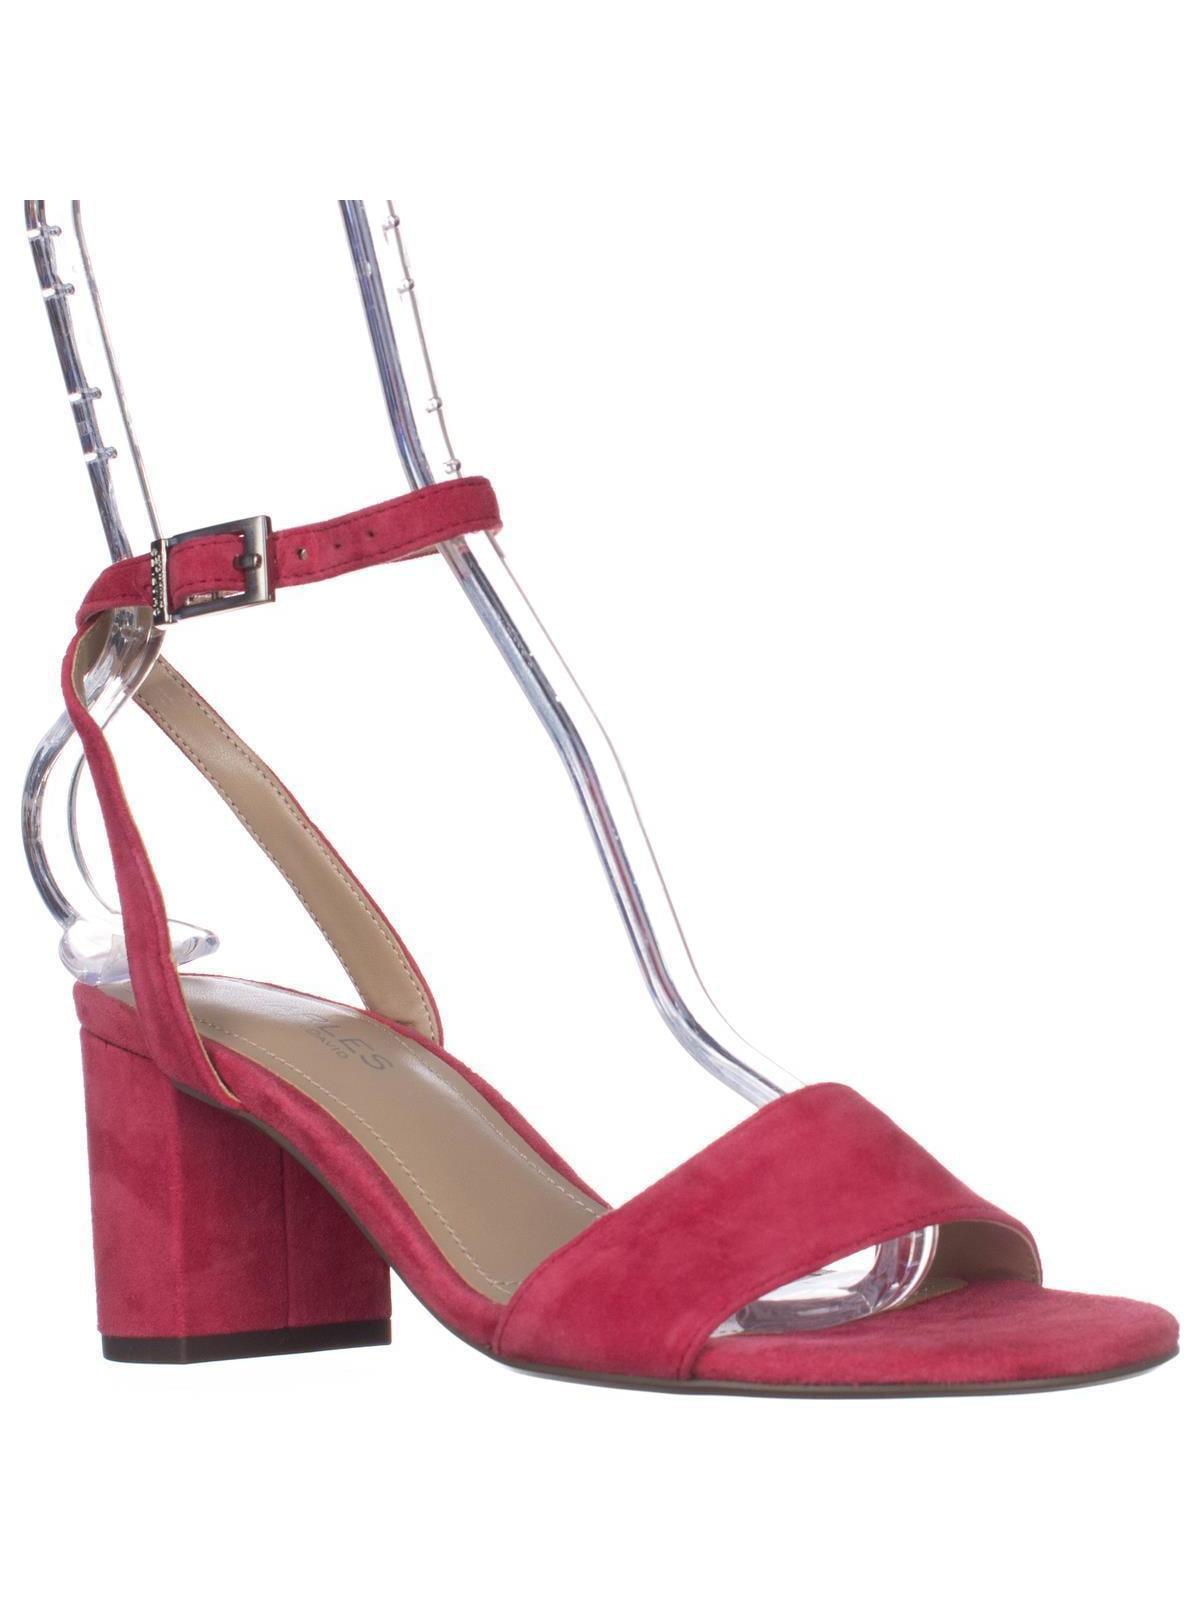 b05079ee2d27e Charles Charles David Keenan Dress Sandals